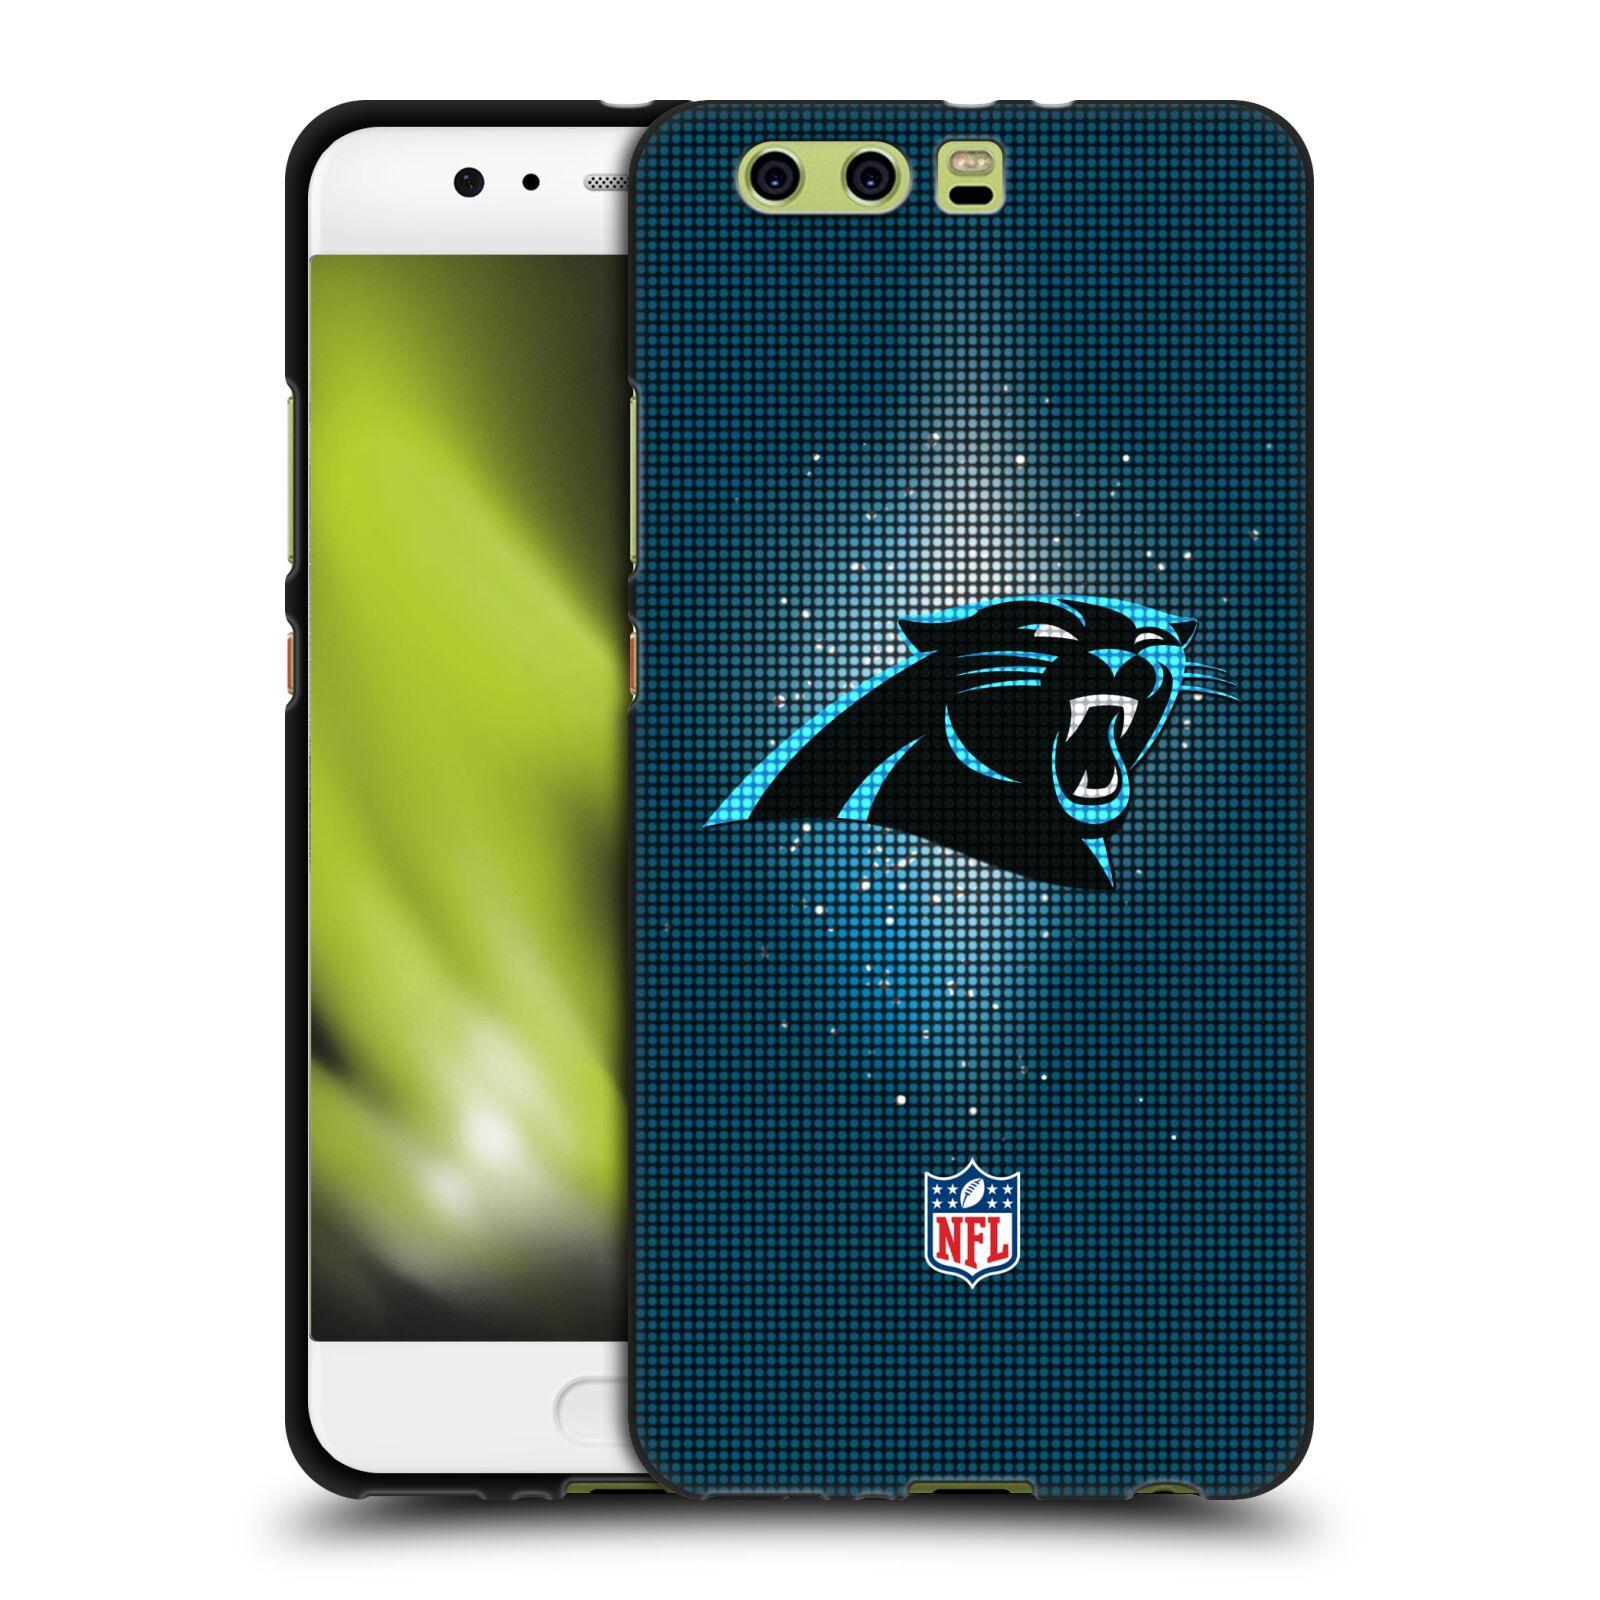 OFFICIAL-NFL-2017-18-CAROLINA-PANTHERS-BLACK-SOFT-GEL-CASE-FOR-HUAWEI-PHONES